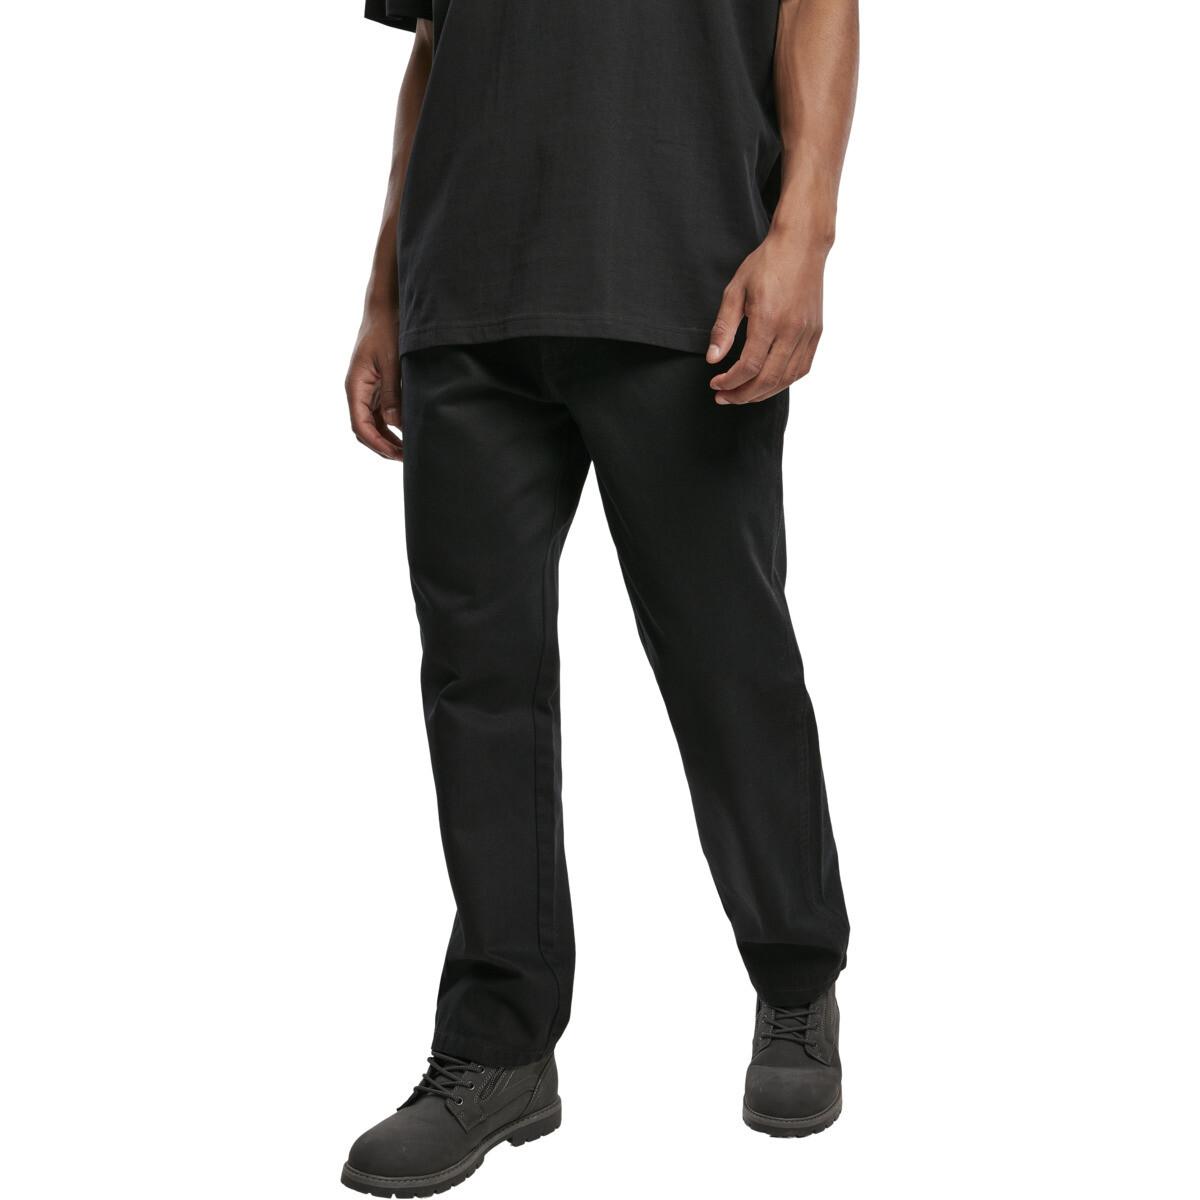 Cross Hatch Basic Denim - Jet Black